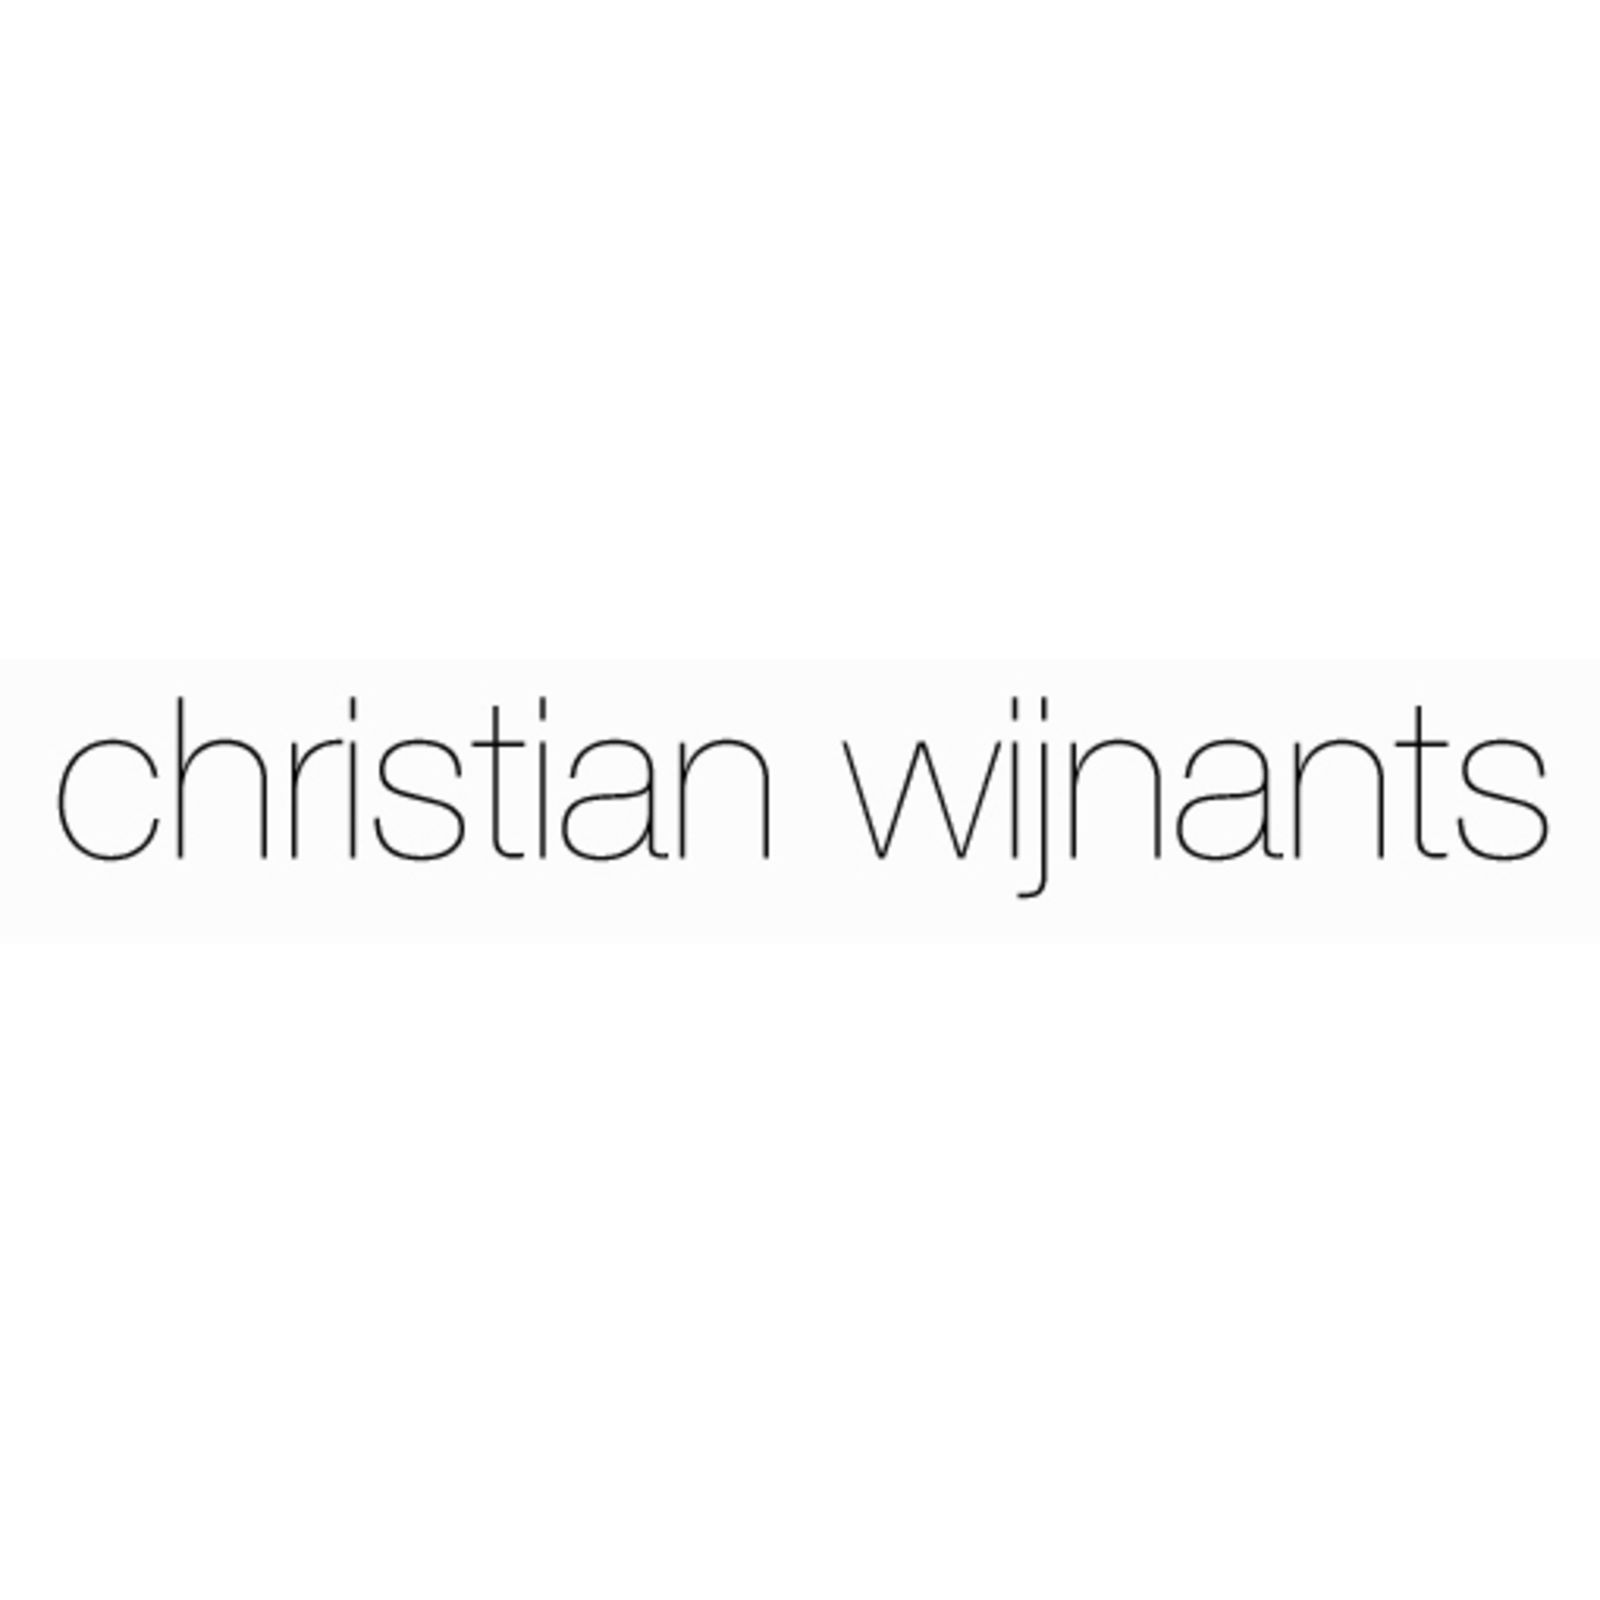 christian wijnants (Image 1)